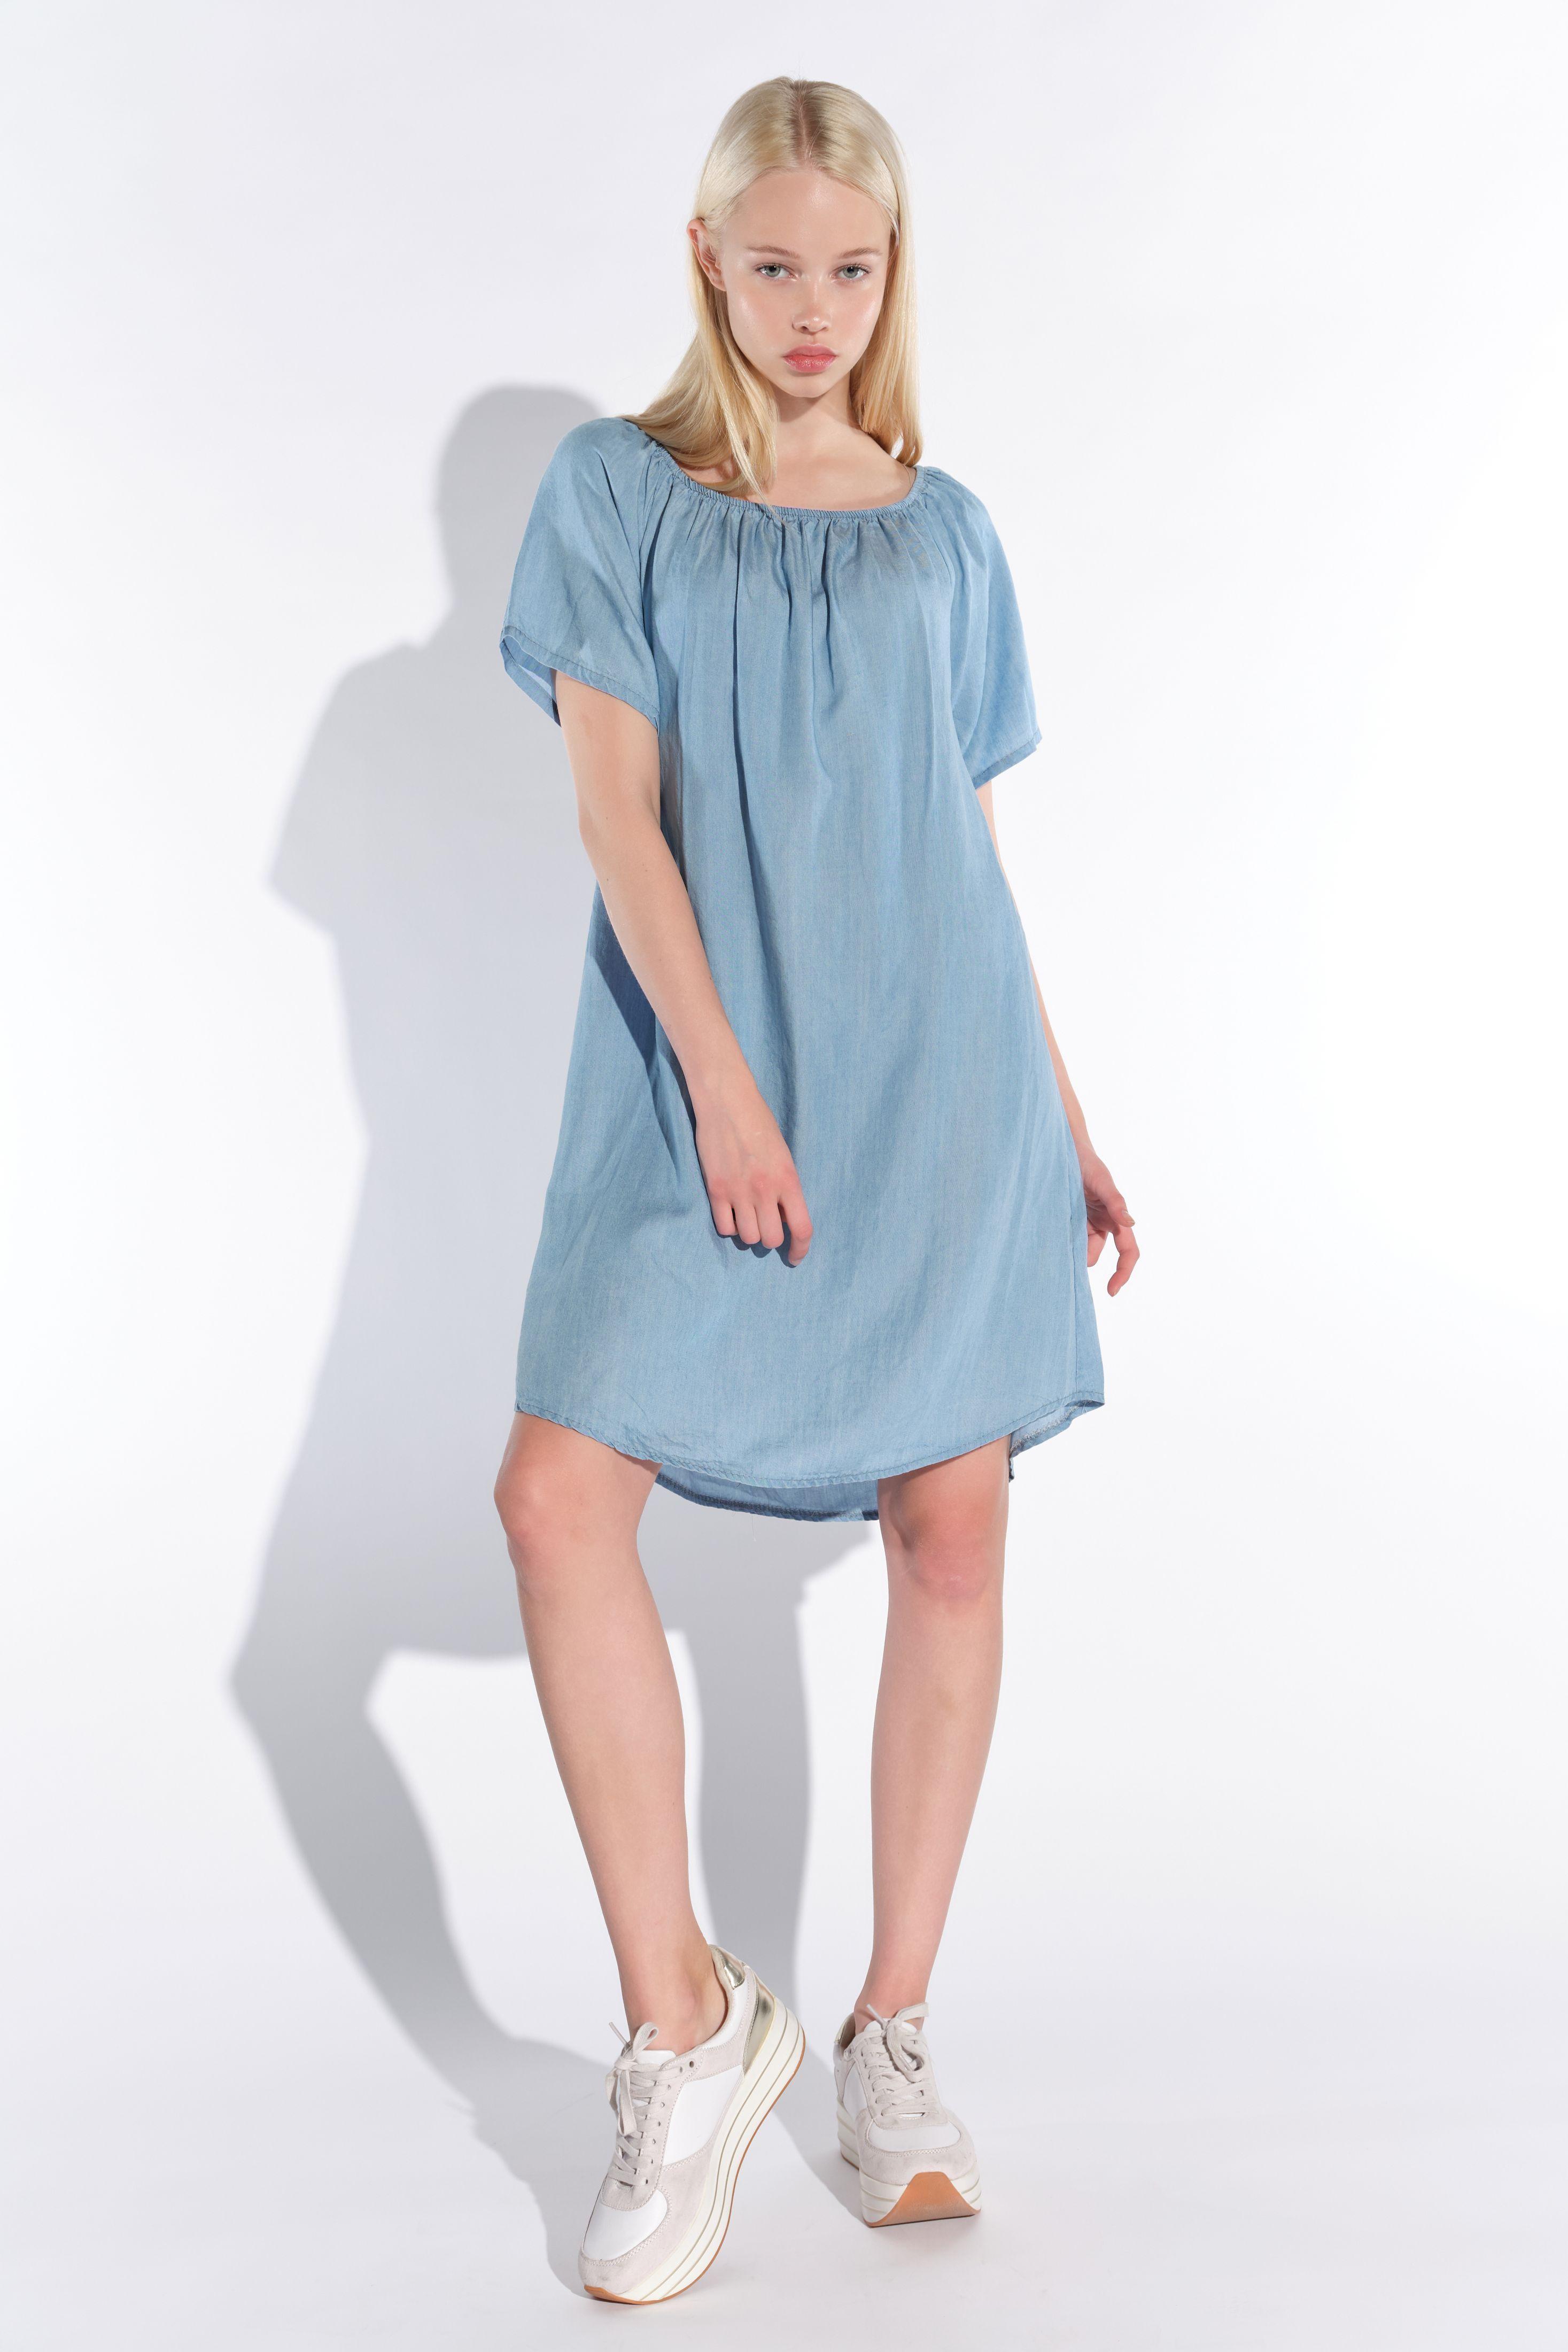 Vestino-Damen-Tunika-Kleid-Mini-Kleid-Jeans-Look-Kurzarm-Tunika-Offshoulder Indexbild 4